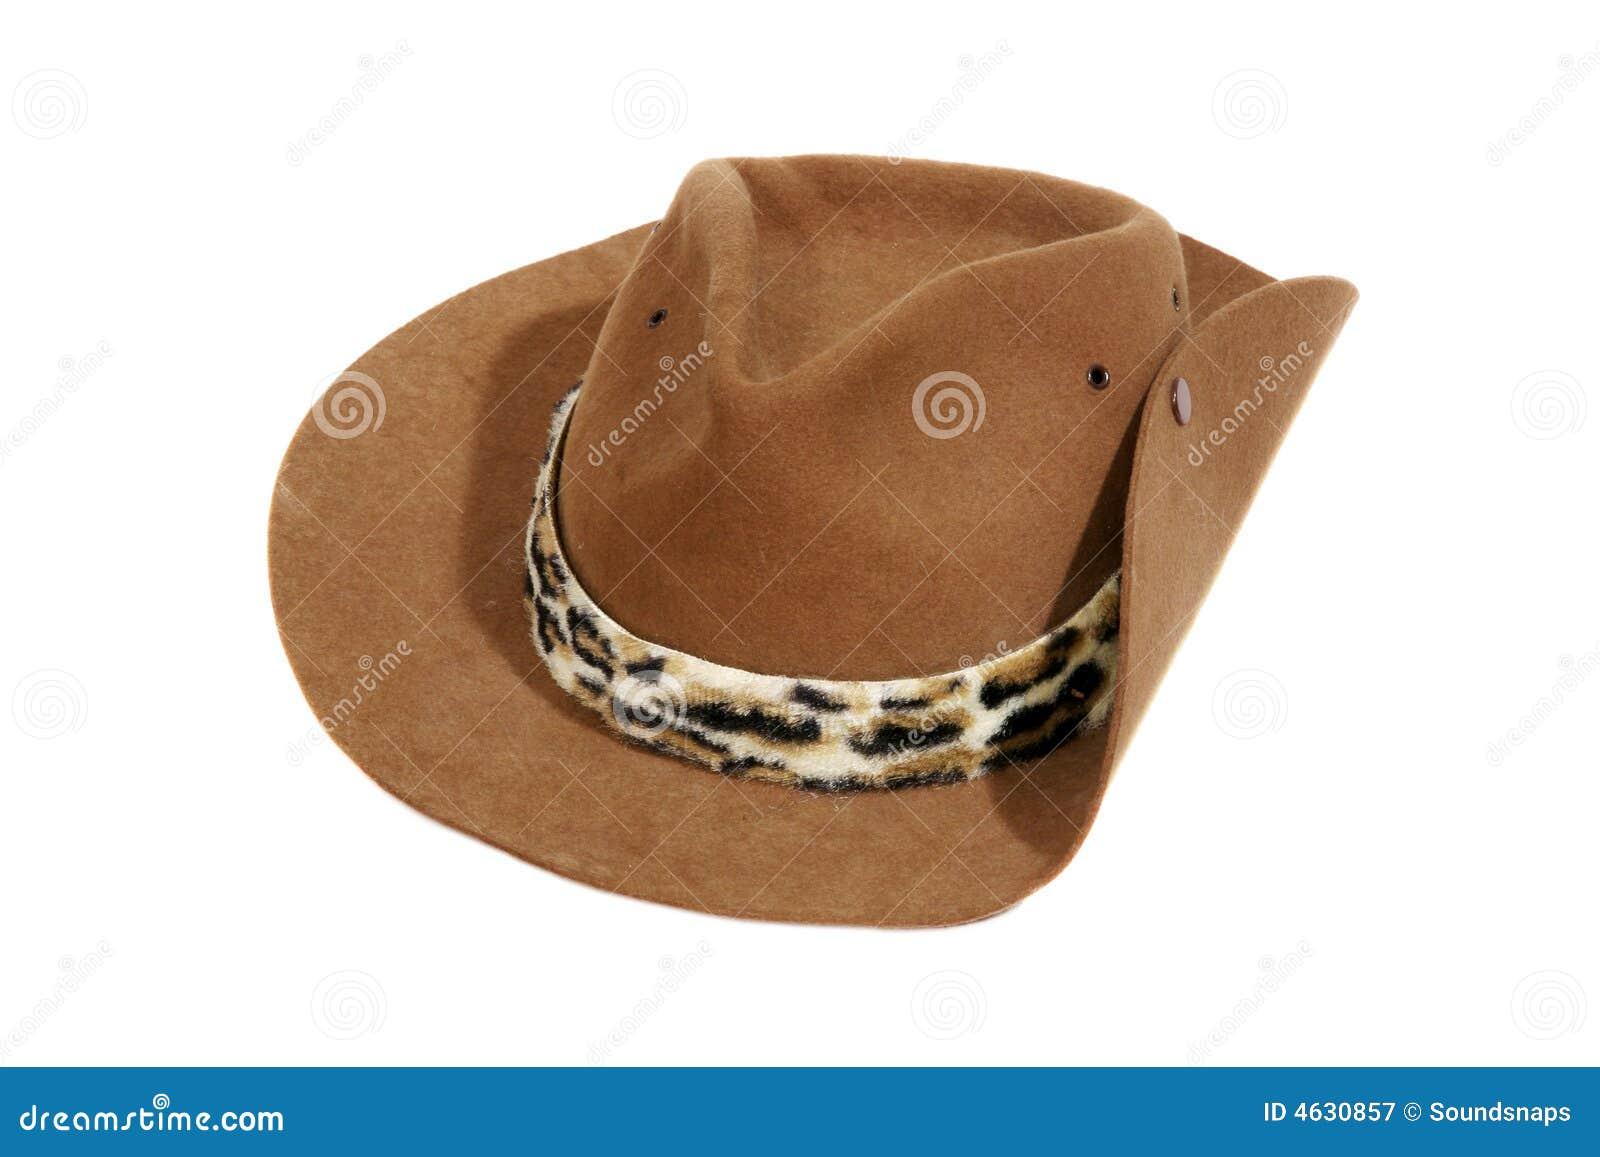 Western cowboy hat clipart